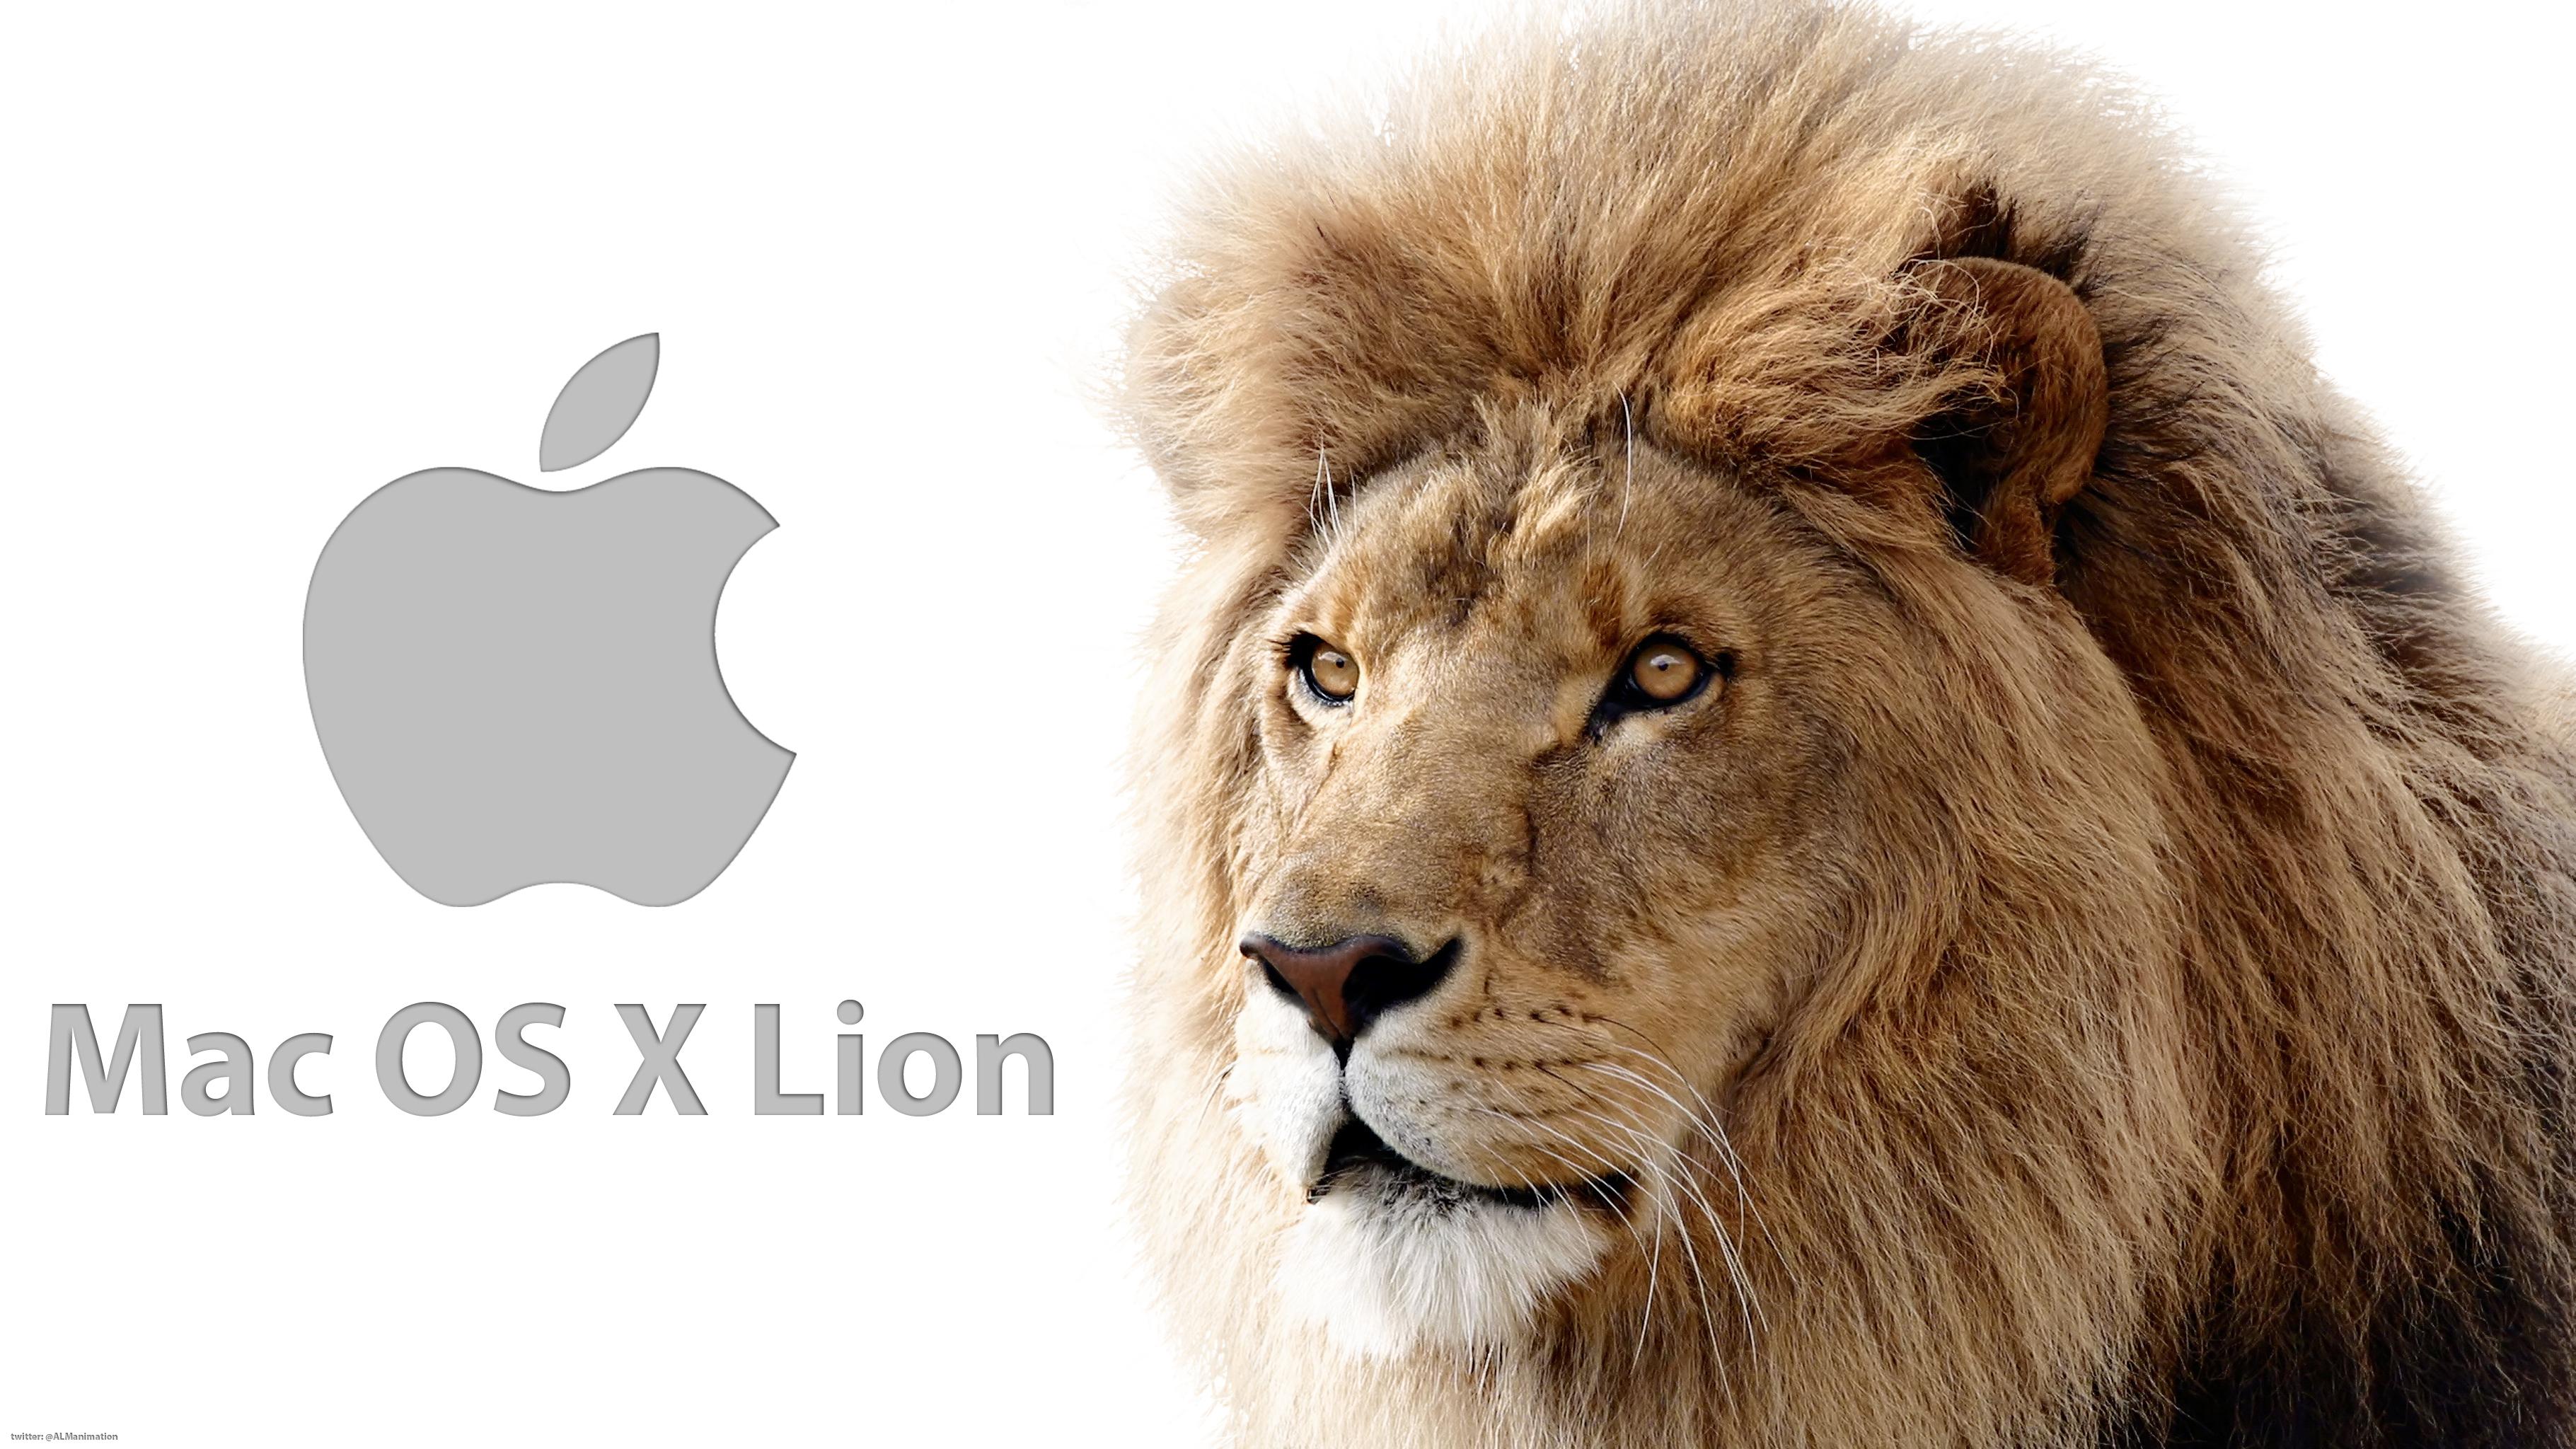 Wallpapers De Mac OS X Lion